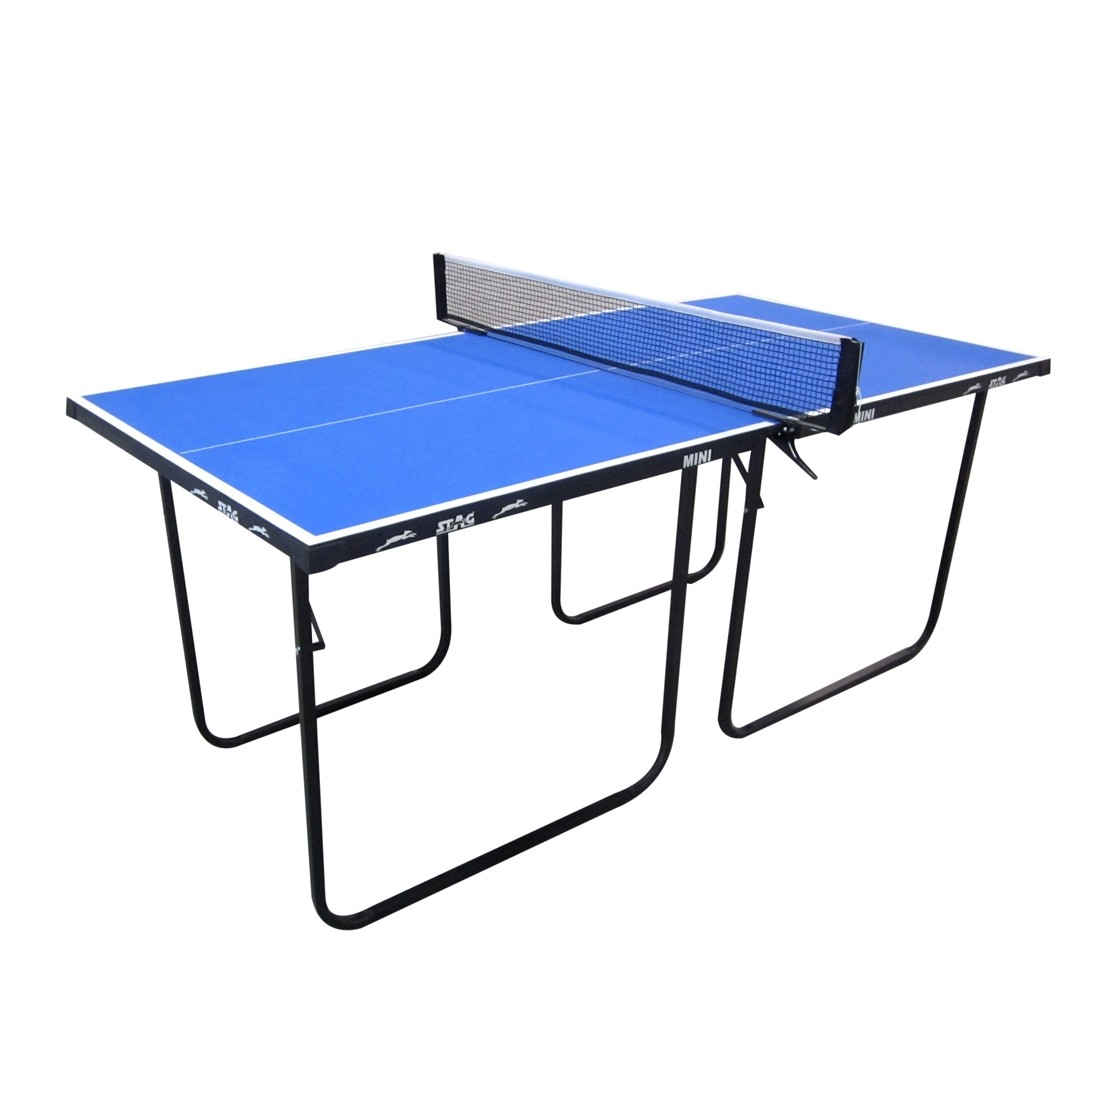 1b0543682 Stag MINI - Table Tennis Tables - Table Tennis - Sport